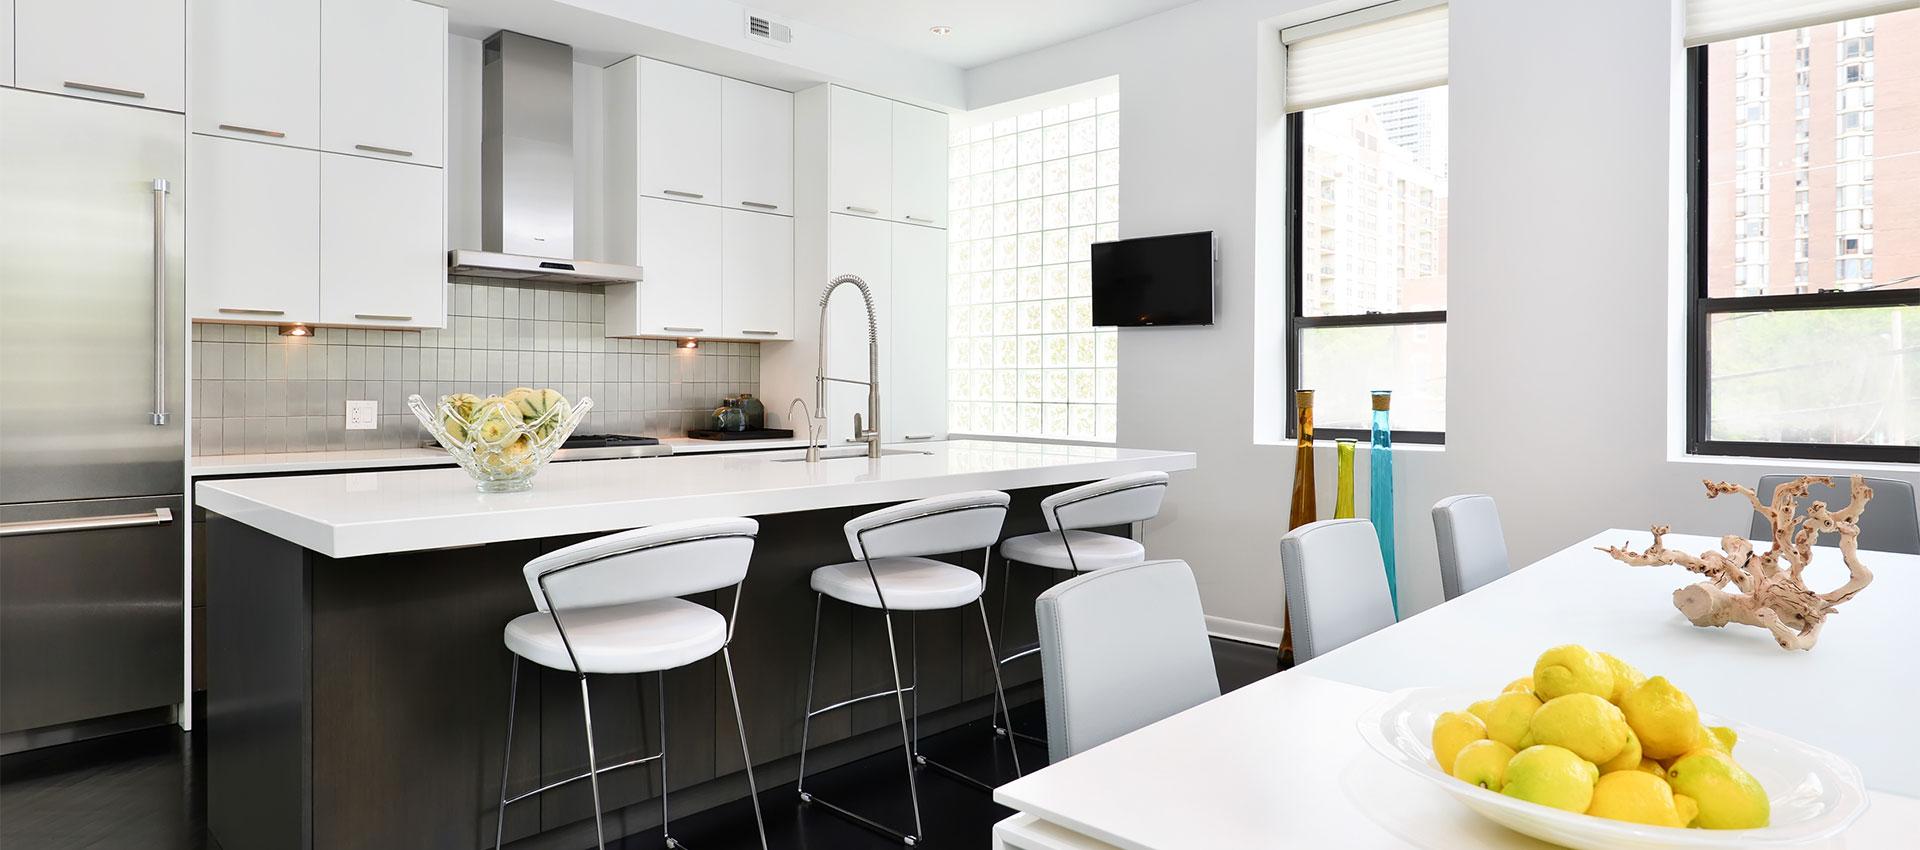 dresner-custom-renovations